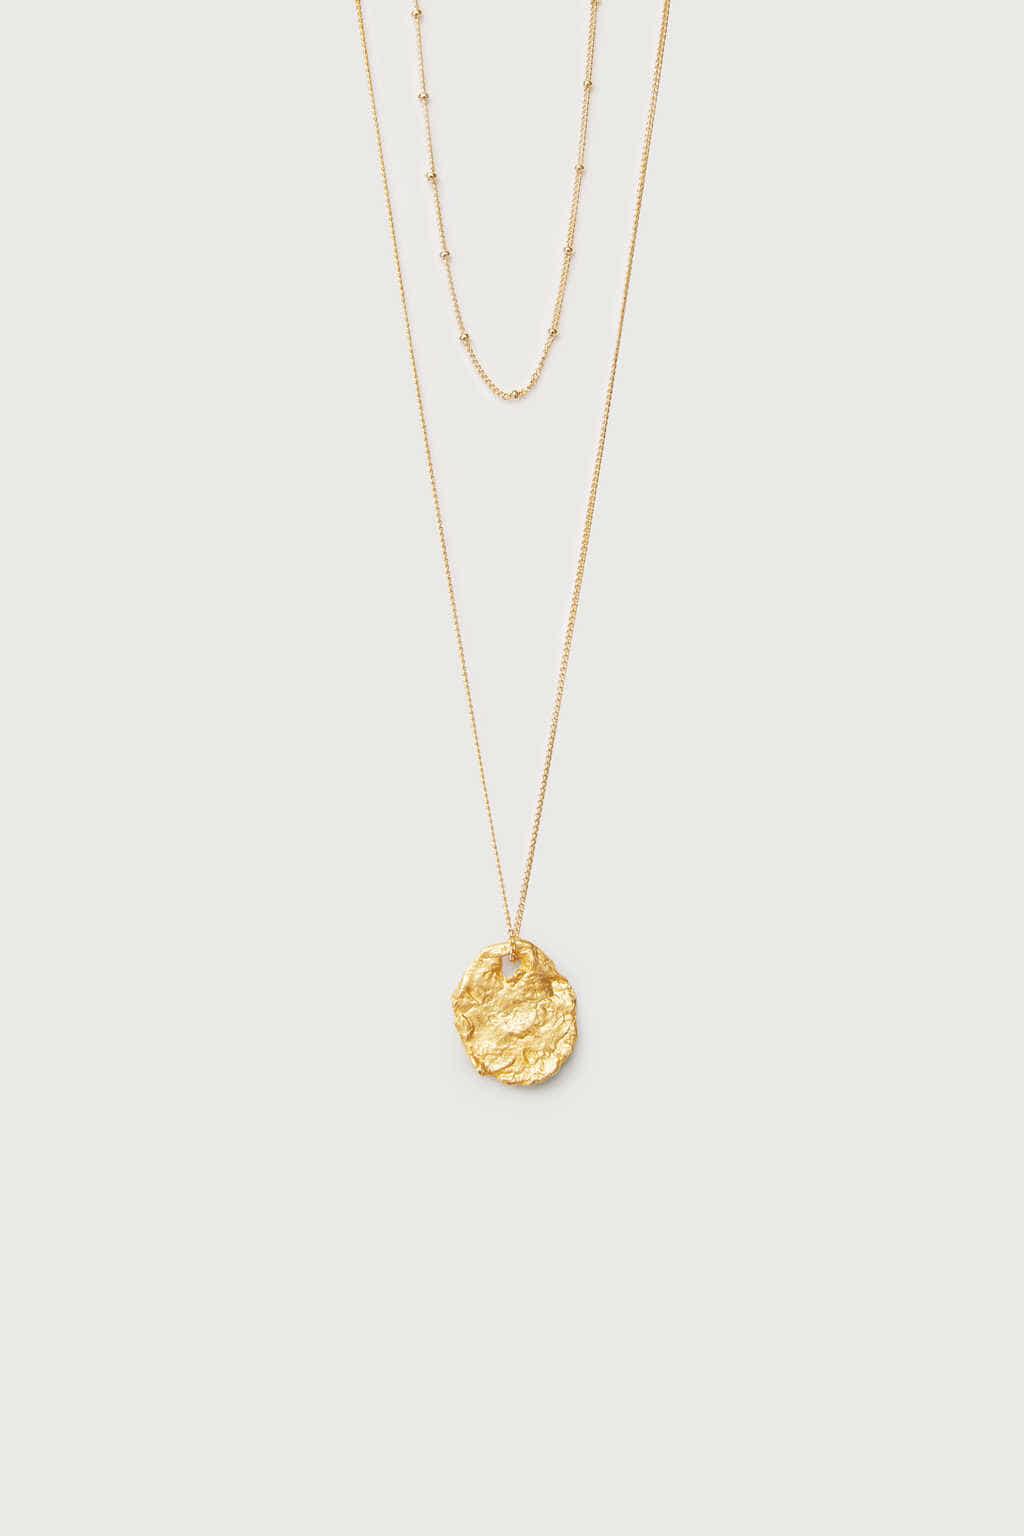 Necklace K002 Gold 2